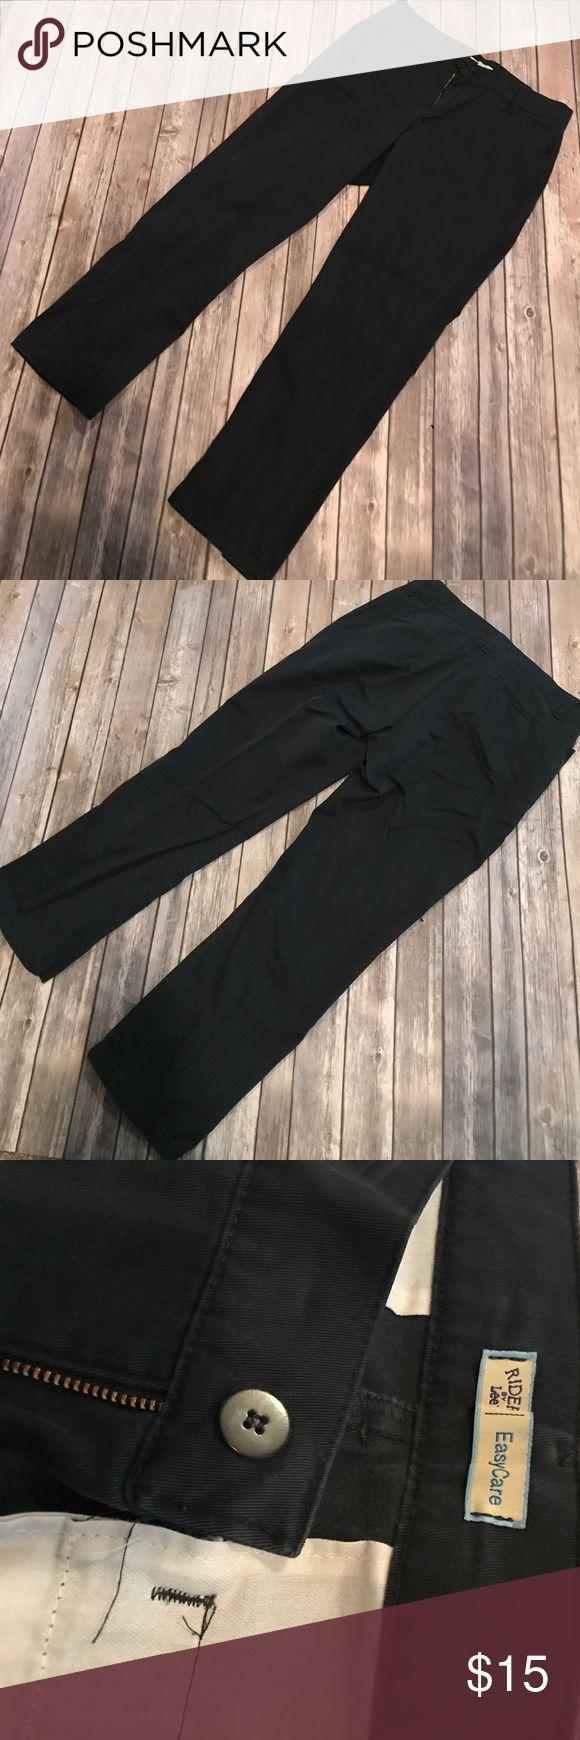 H m black dress pants by lee